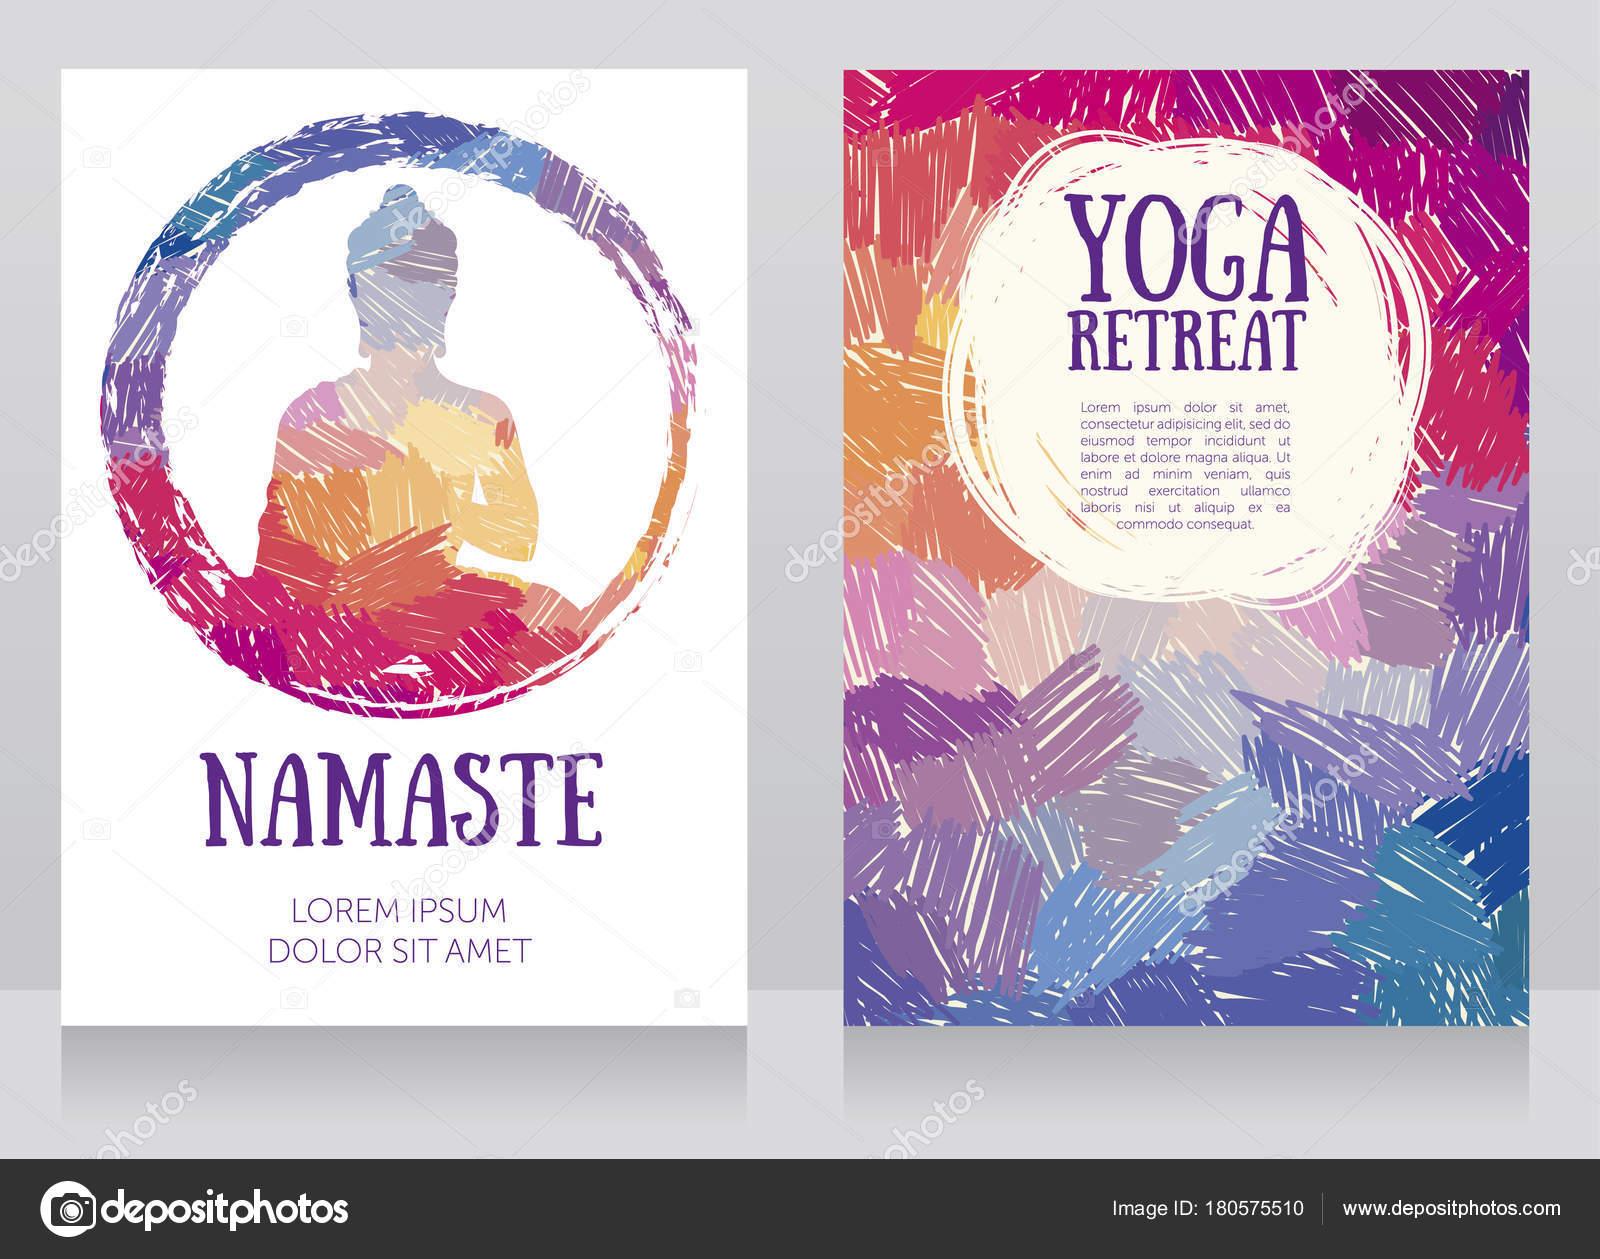 Fotos Fondos Para Yoga Dos Tarjetas Para Estudio Yoga Con Silueta